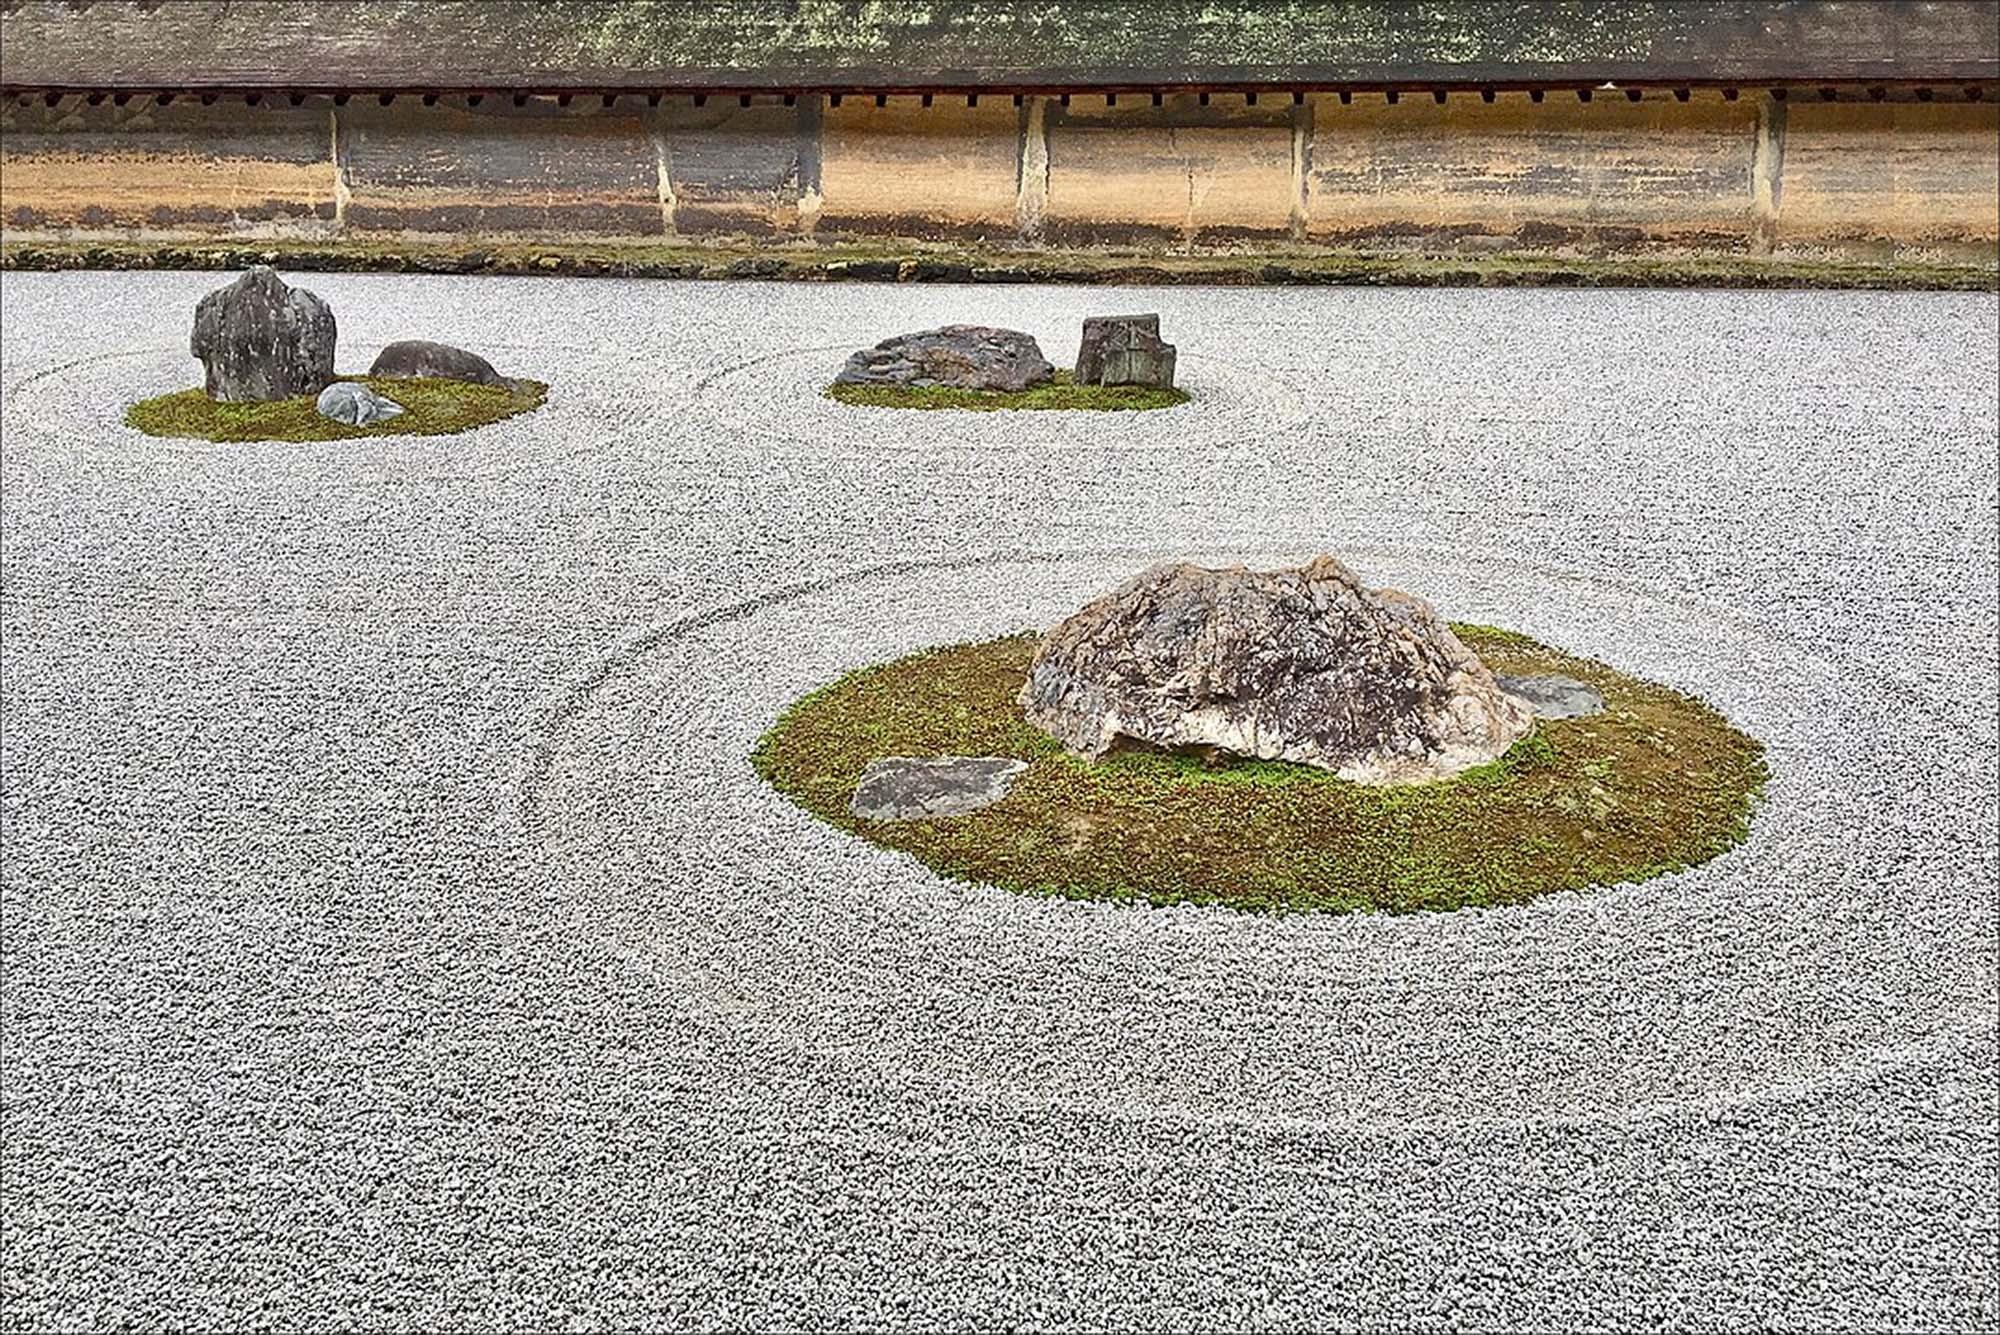 Zen Garden at Ryoan-ji, Kyoto, Japan